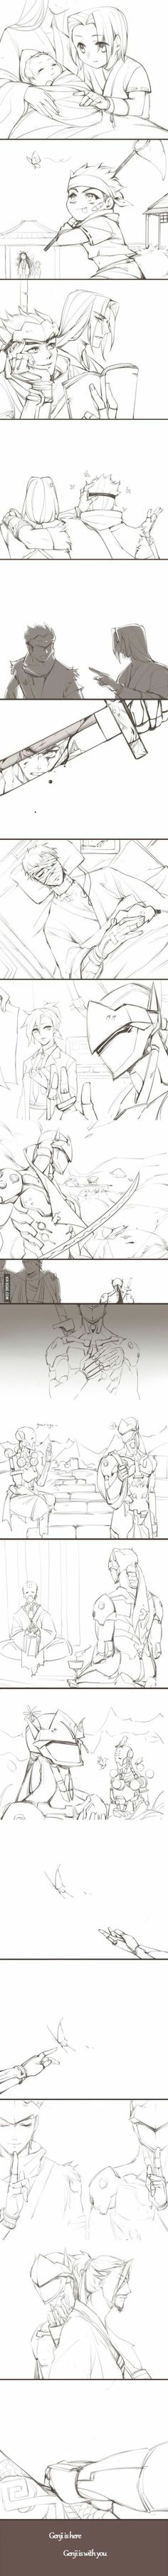 Genji backstory - 9GAG